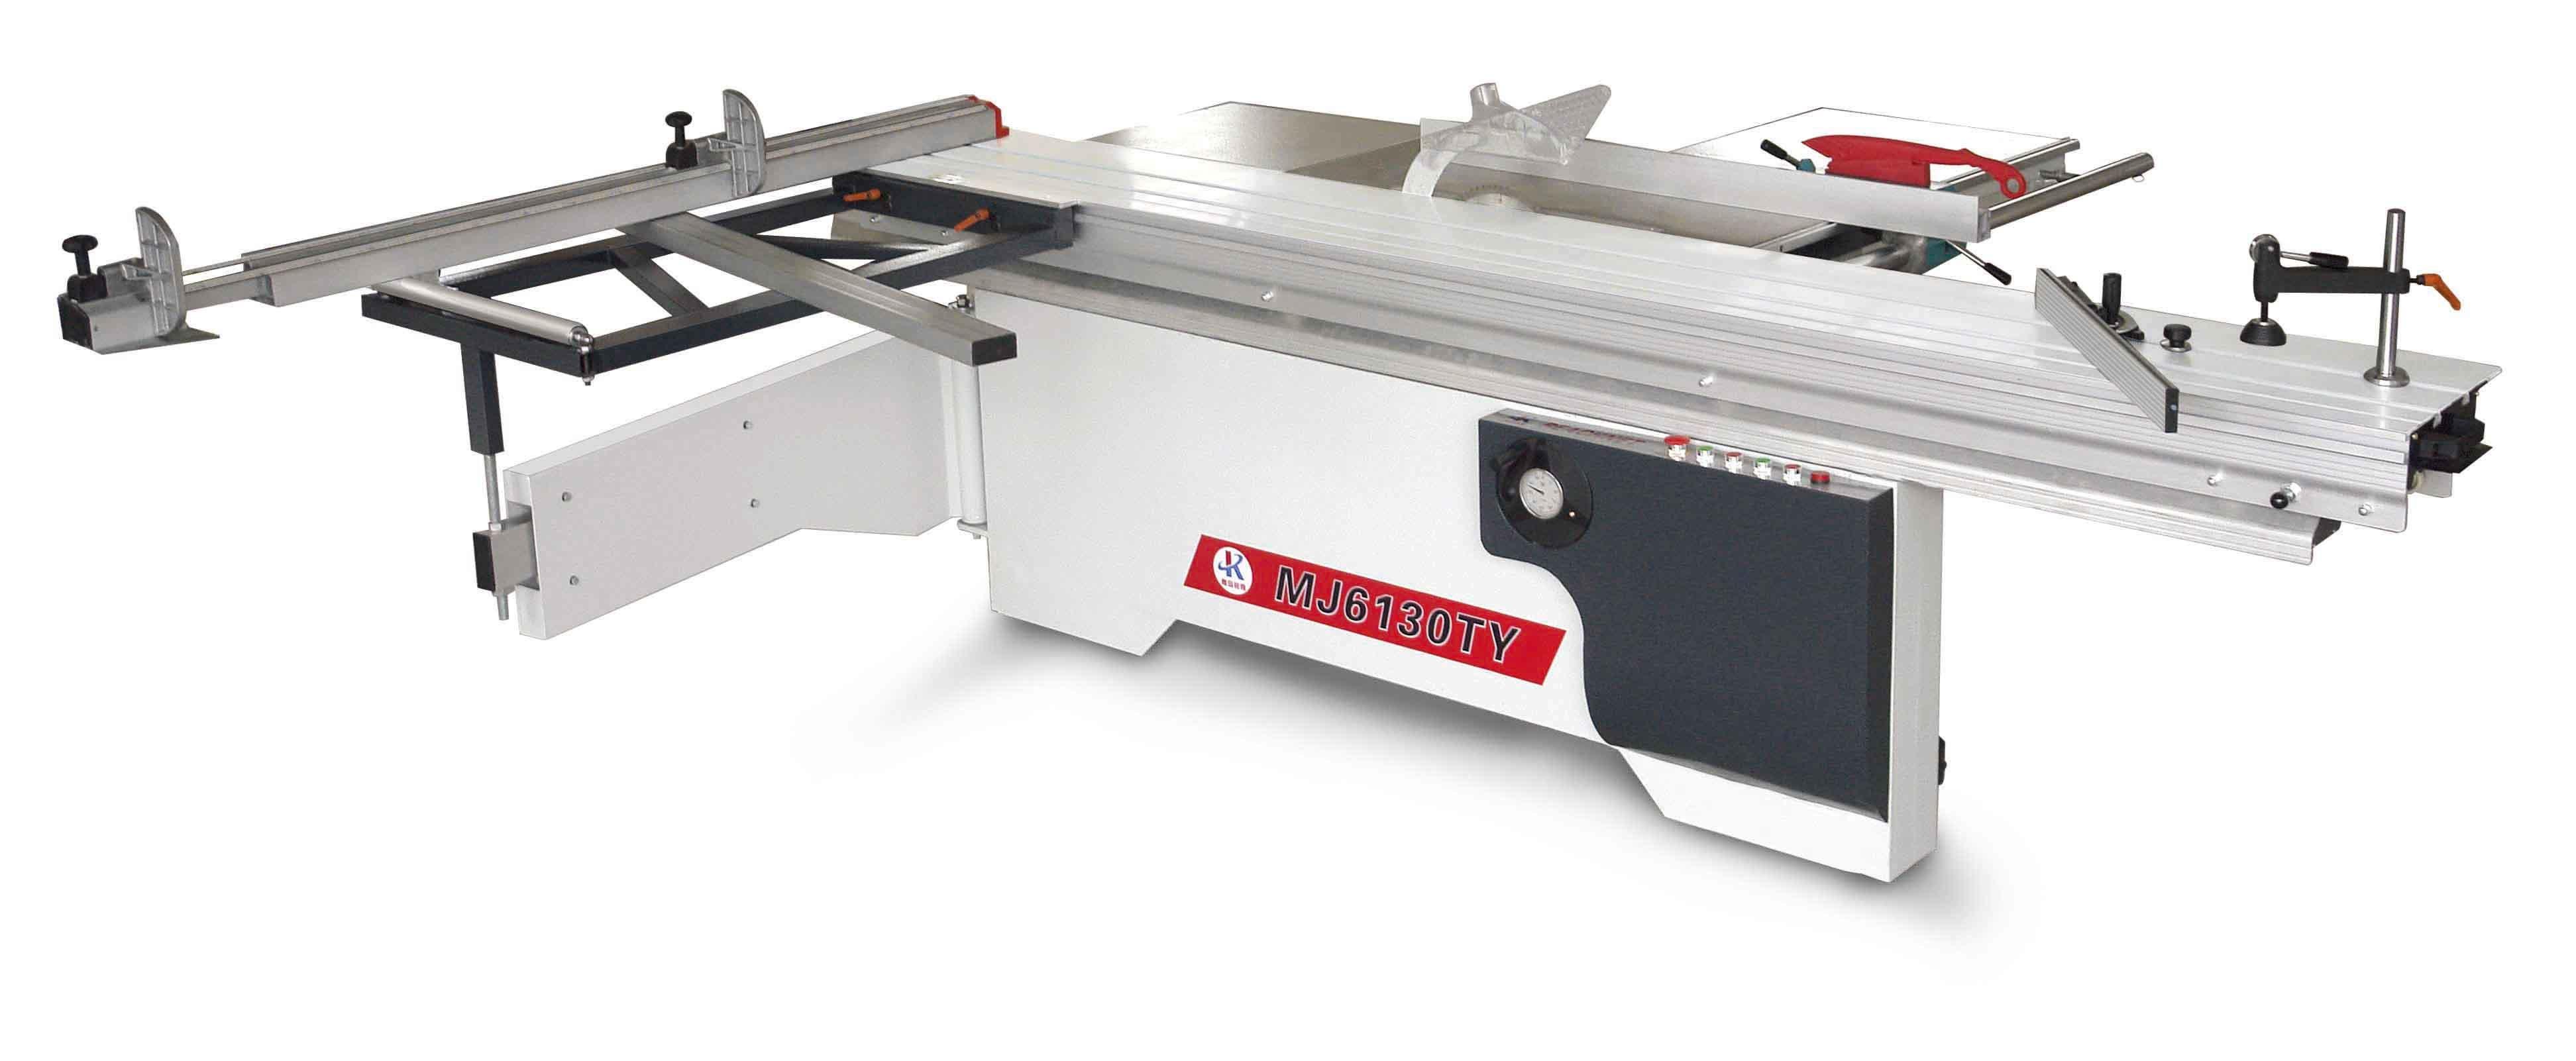 Wood Cutting Machine (MJ6130TY) - China Wood Cutting ...